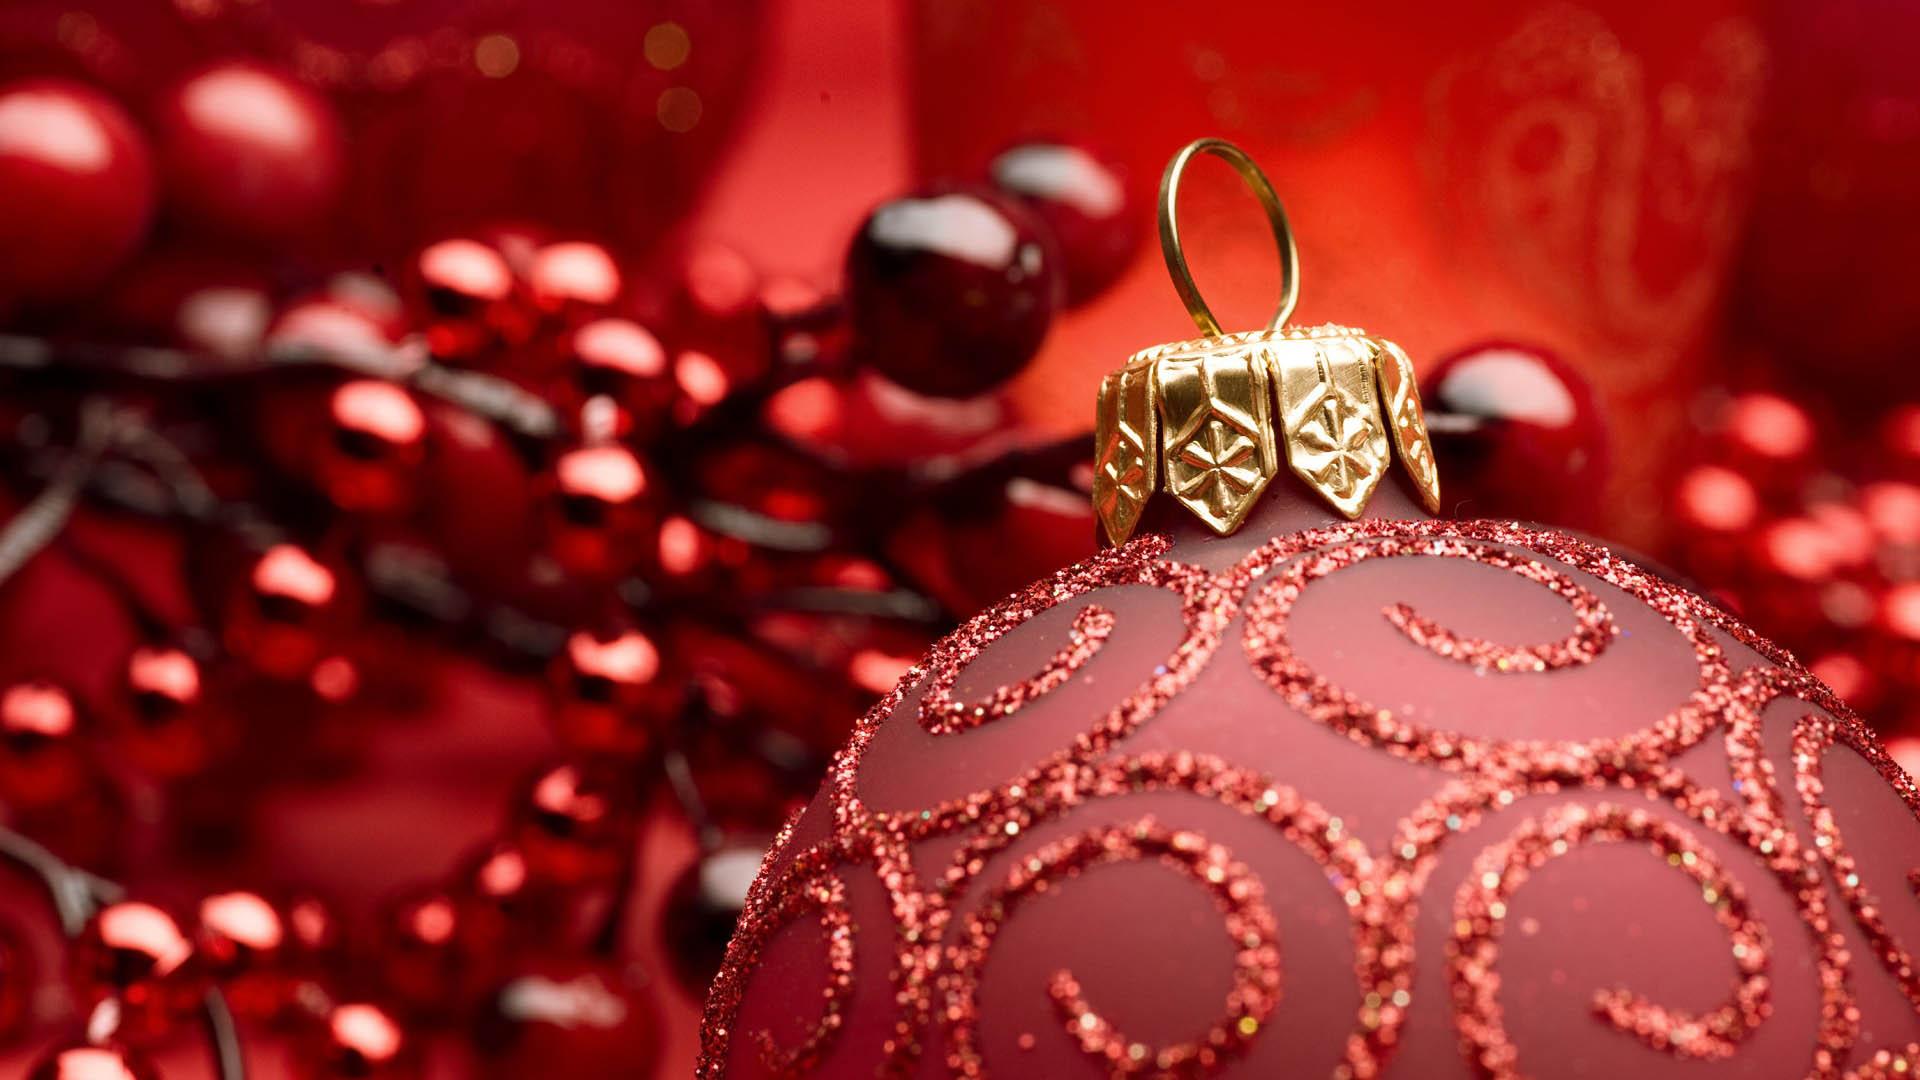 Tumblr Fondos De Pantalla De Navidad: 𝑅𝒽𝑒𝒶'𝓈 𝐵𝓁𝑜𝑔